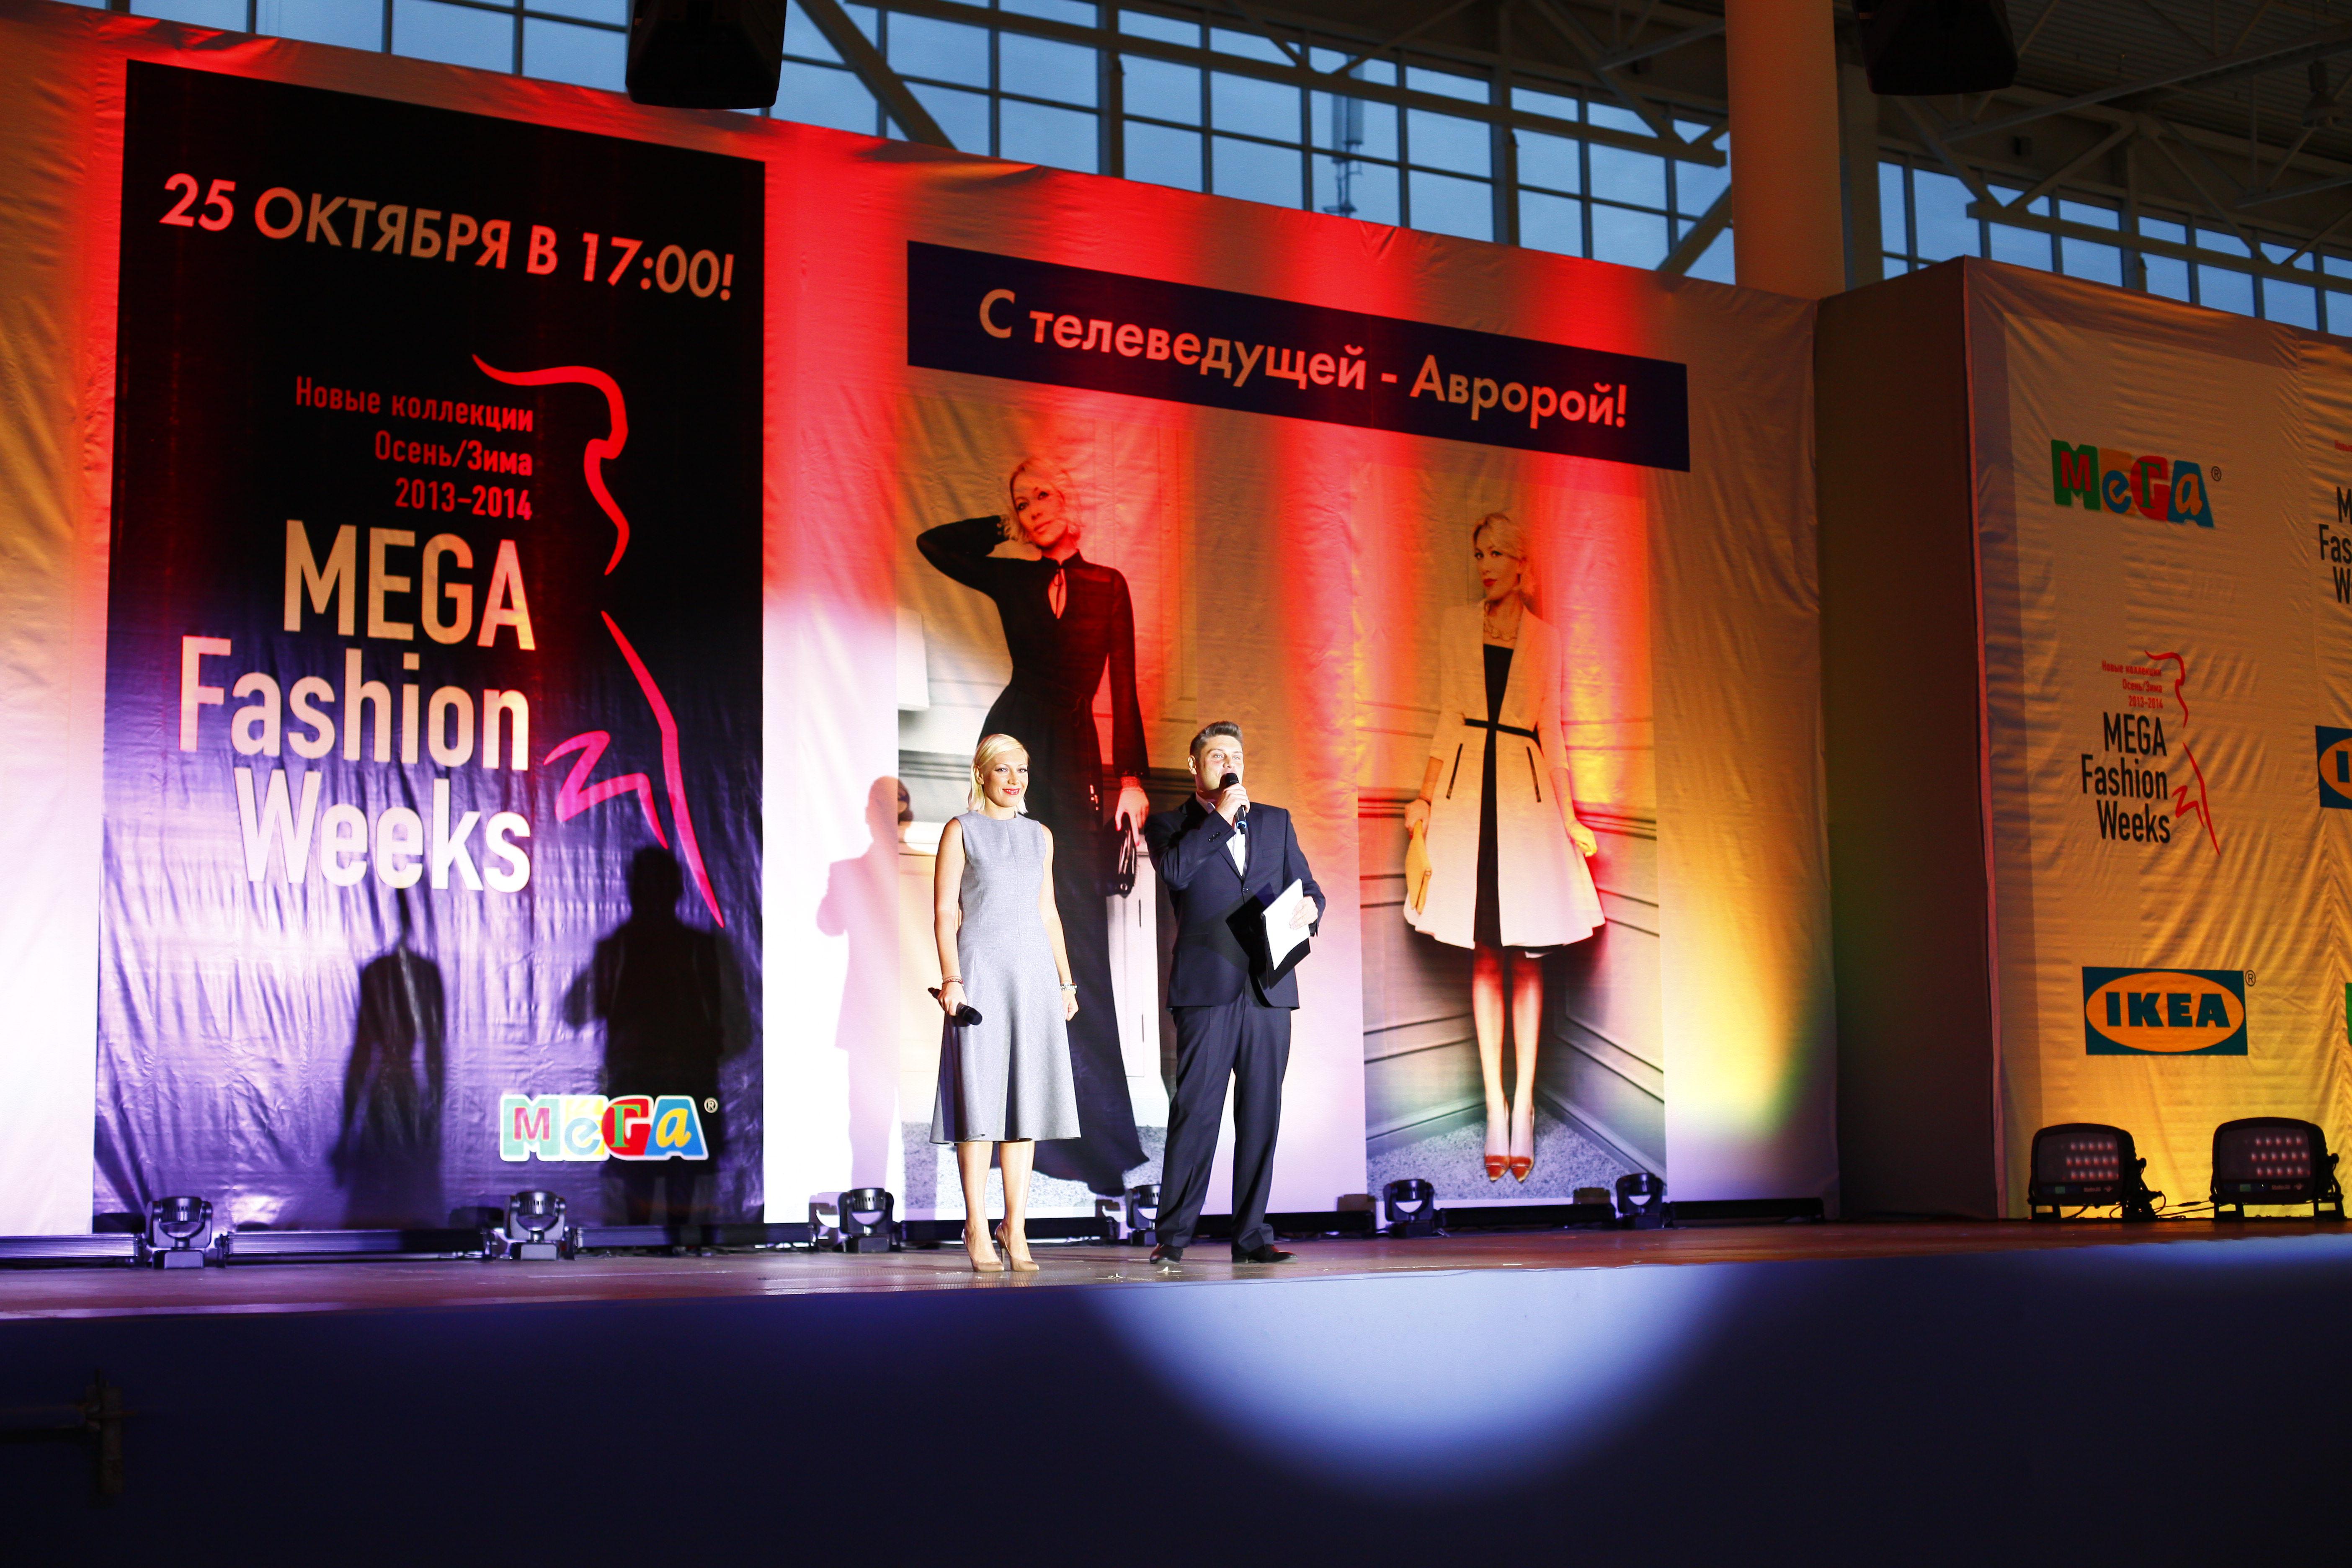 мега нижний новгород оби: